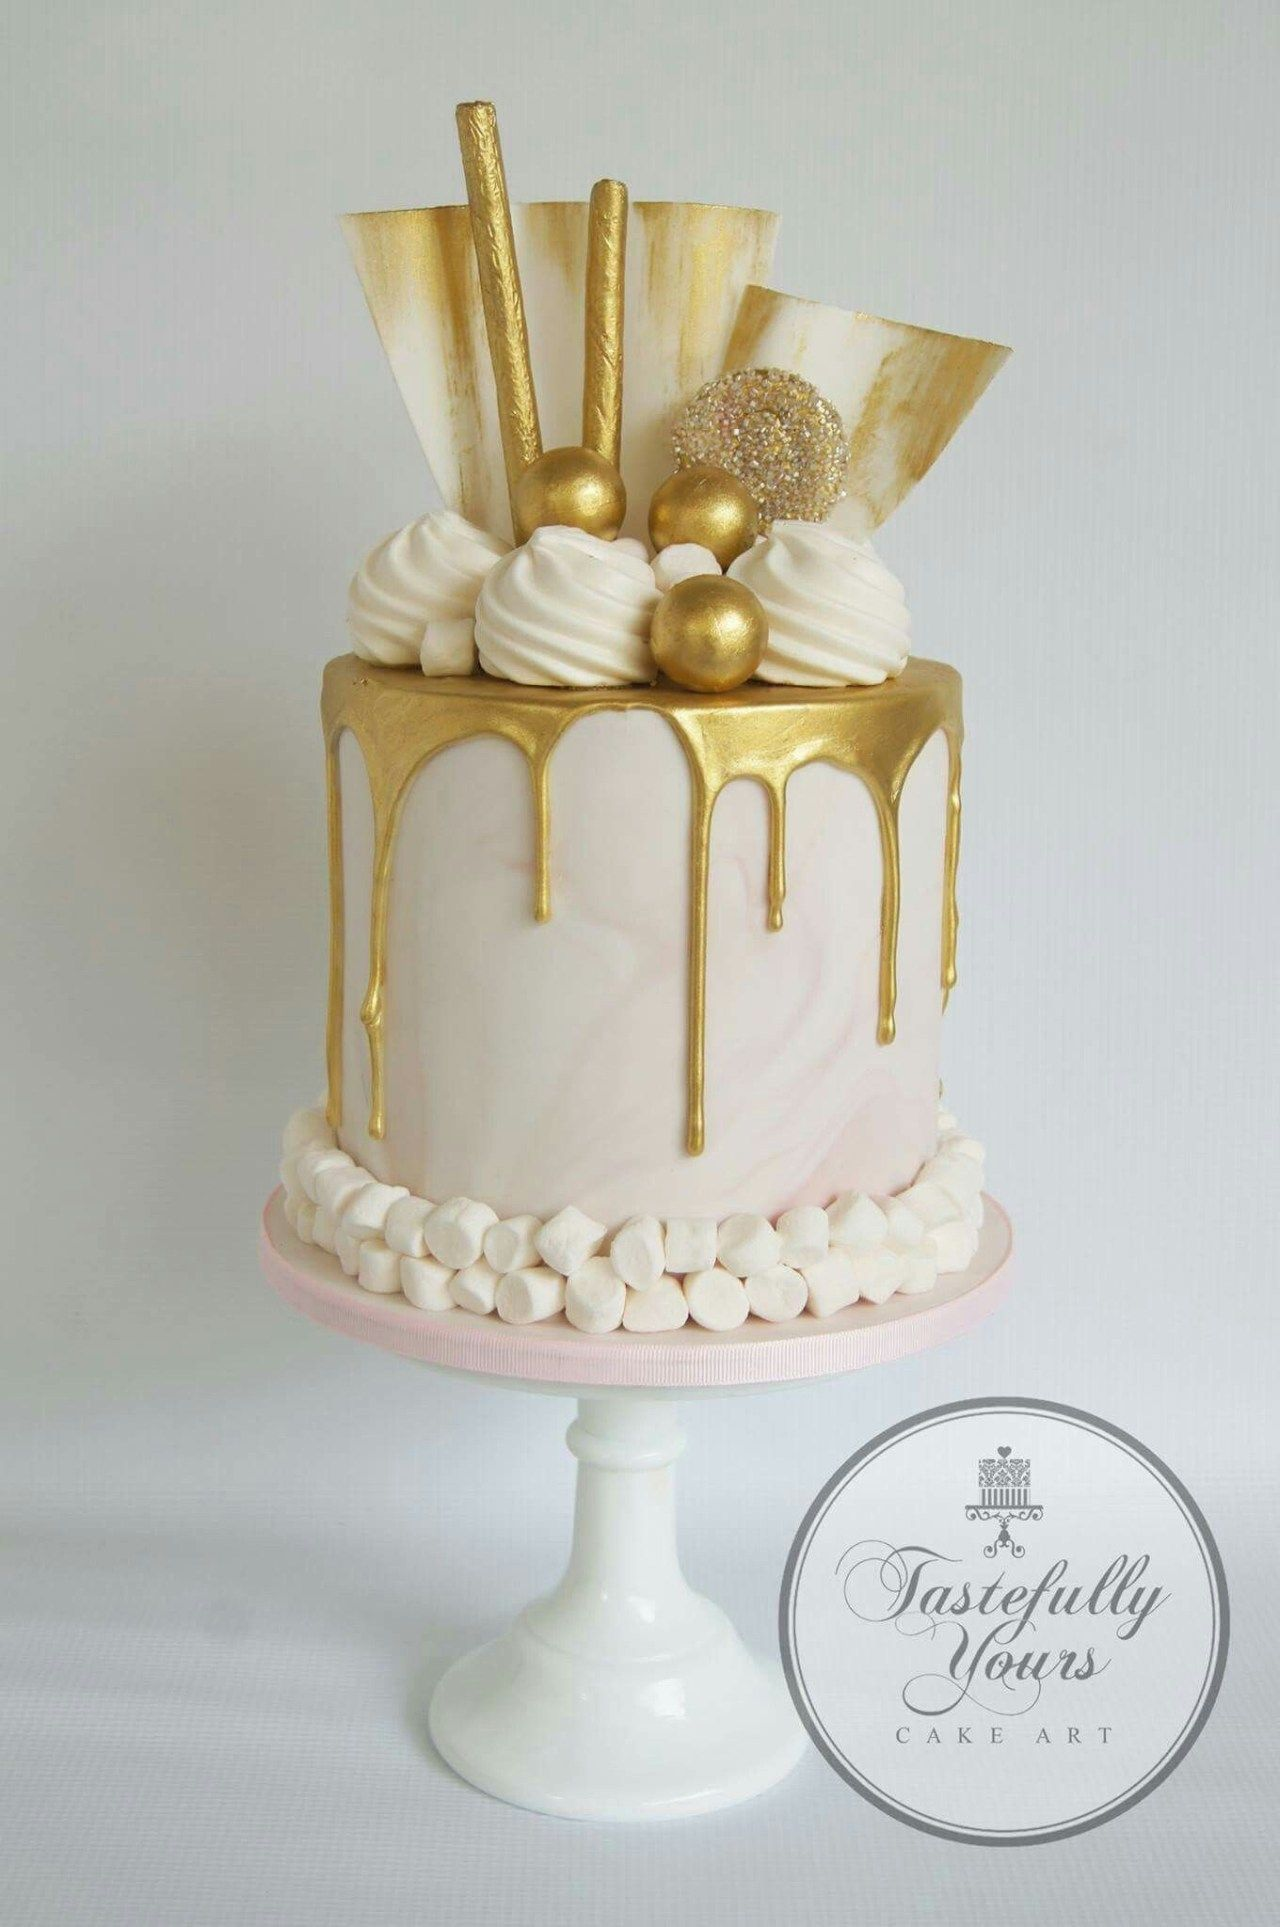 Swell Elegant Birthday Cakes Pin Michelle Juranko On Cakes Pinterest Funny Birthday Cards Online Alyptdamsfinfo